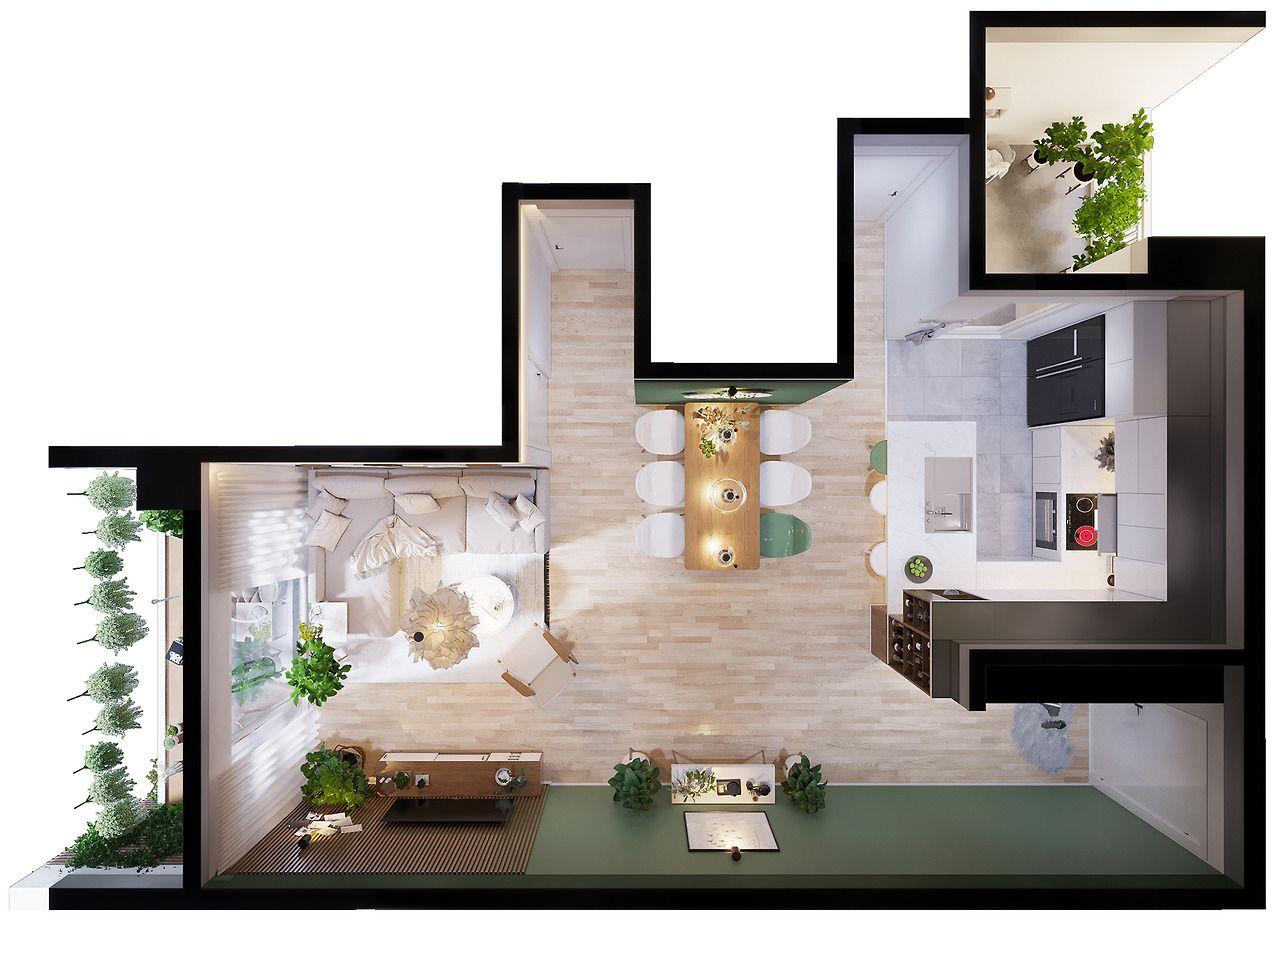 Via Homedesigning Scandinavian Style Home Unique House Design House Design